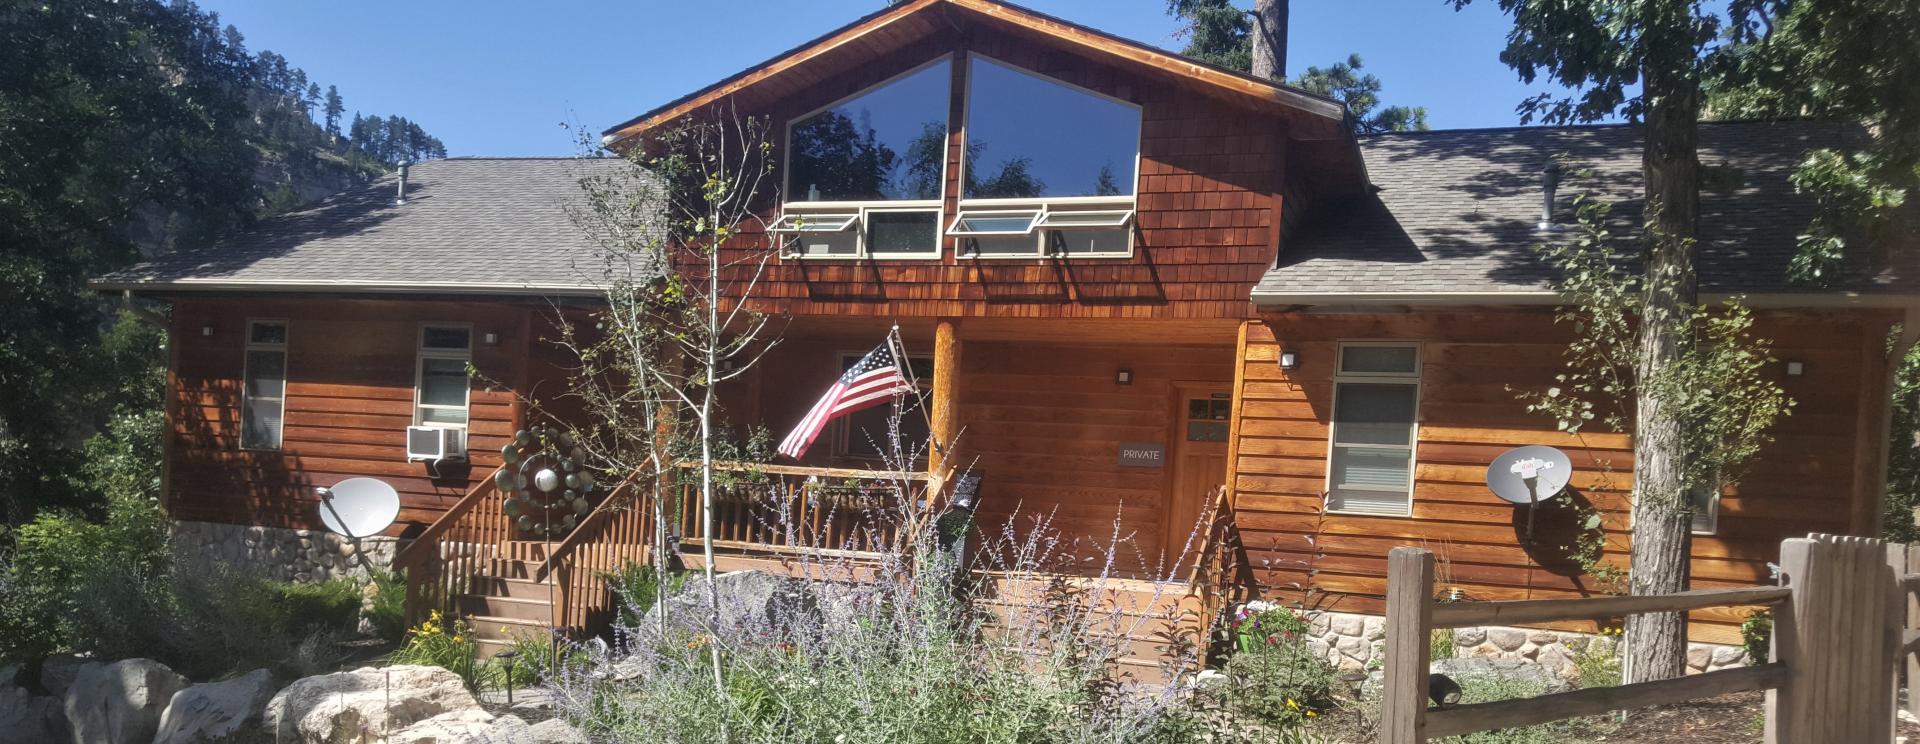 Rim Rock Lodge